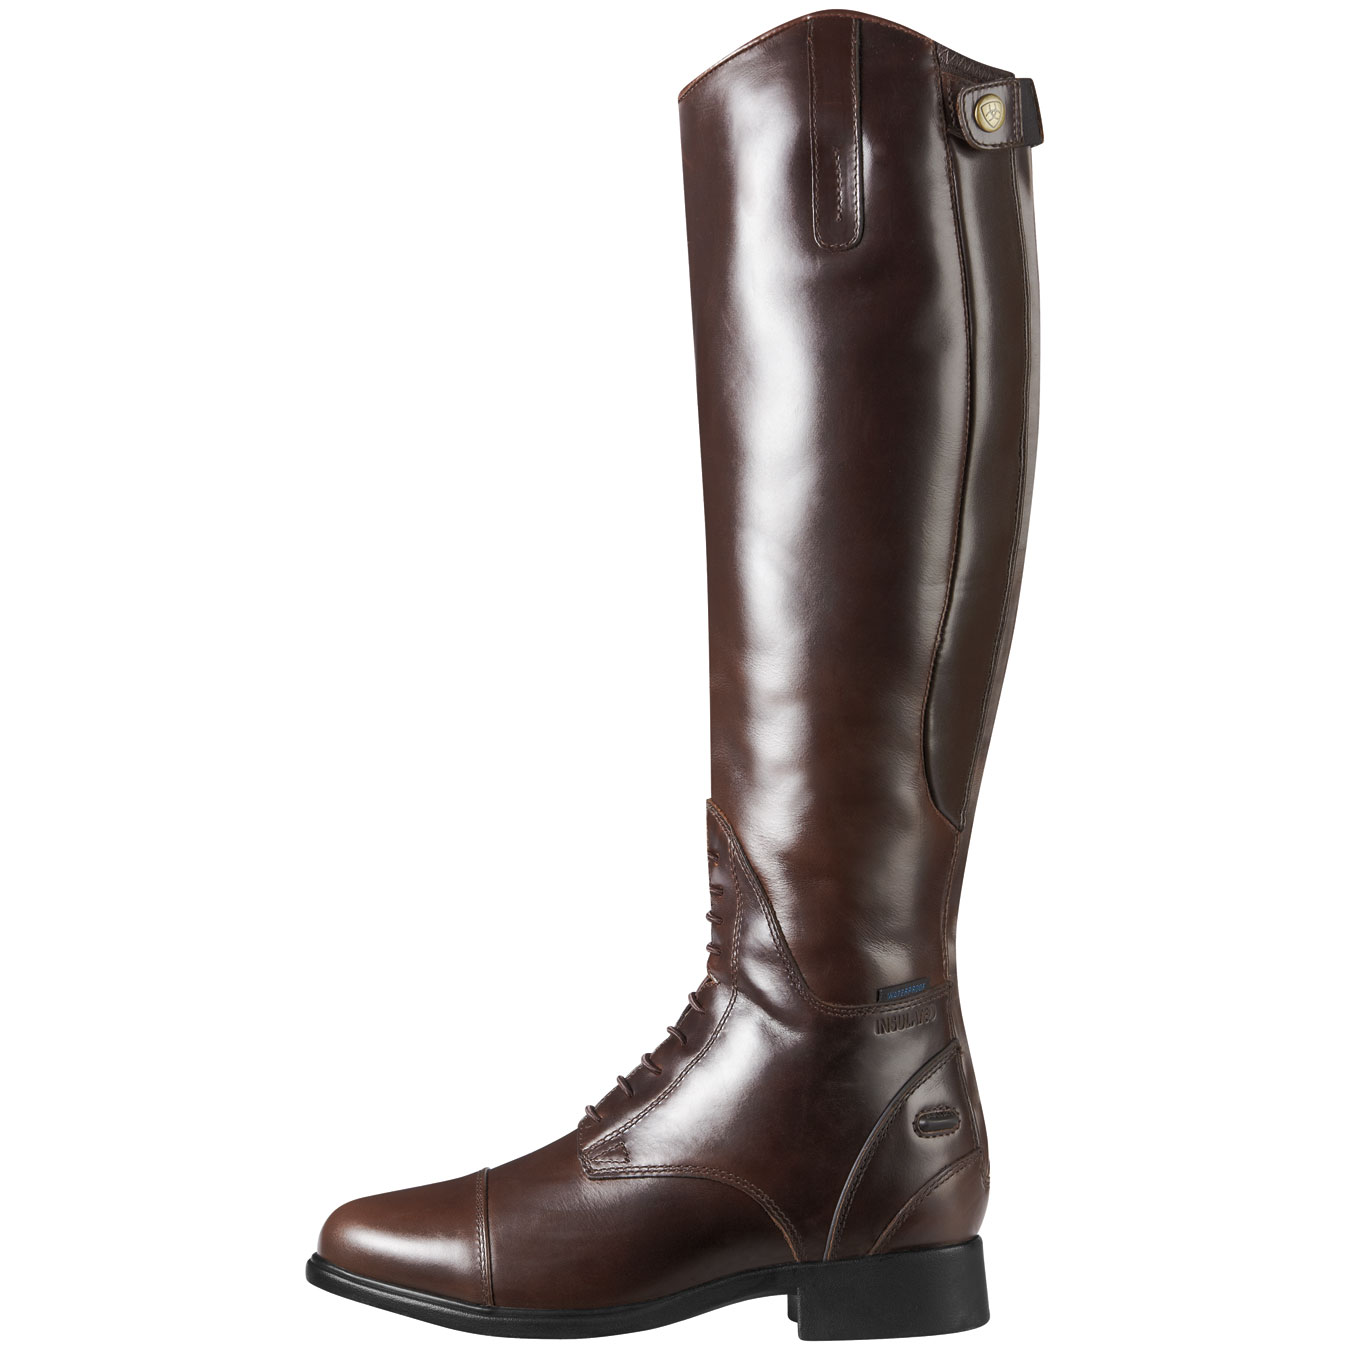 Ariat Winter Boots Sale | Santa Barbara Institute for